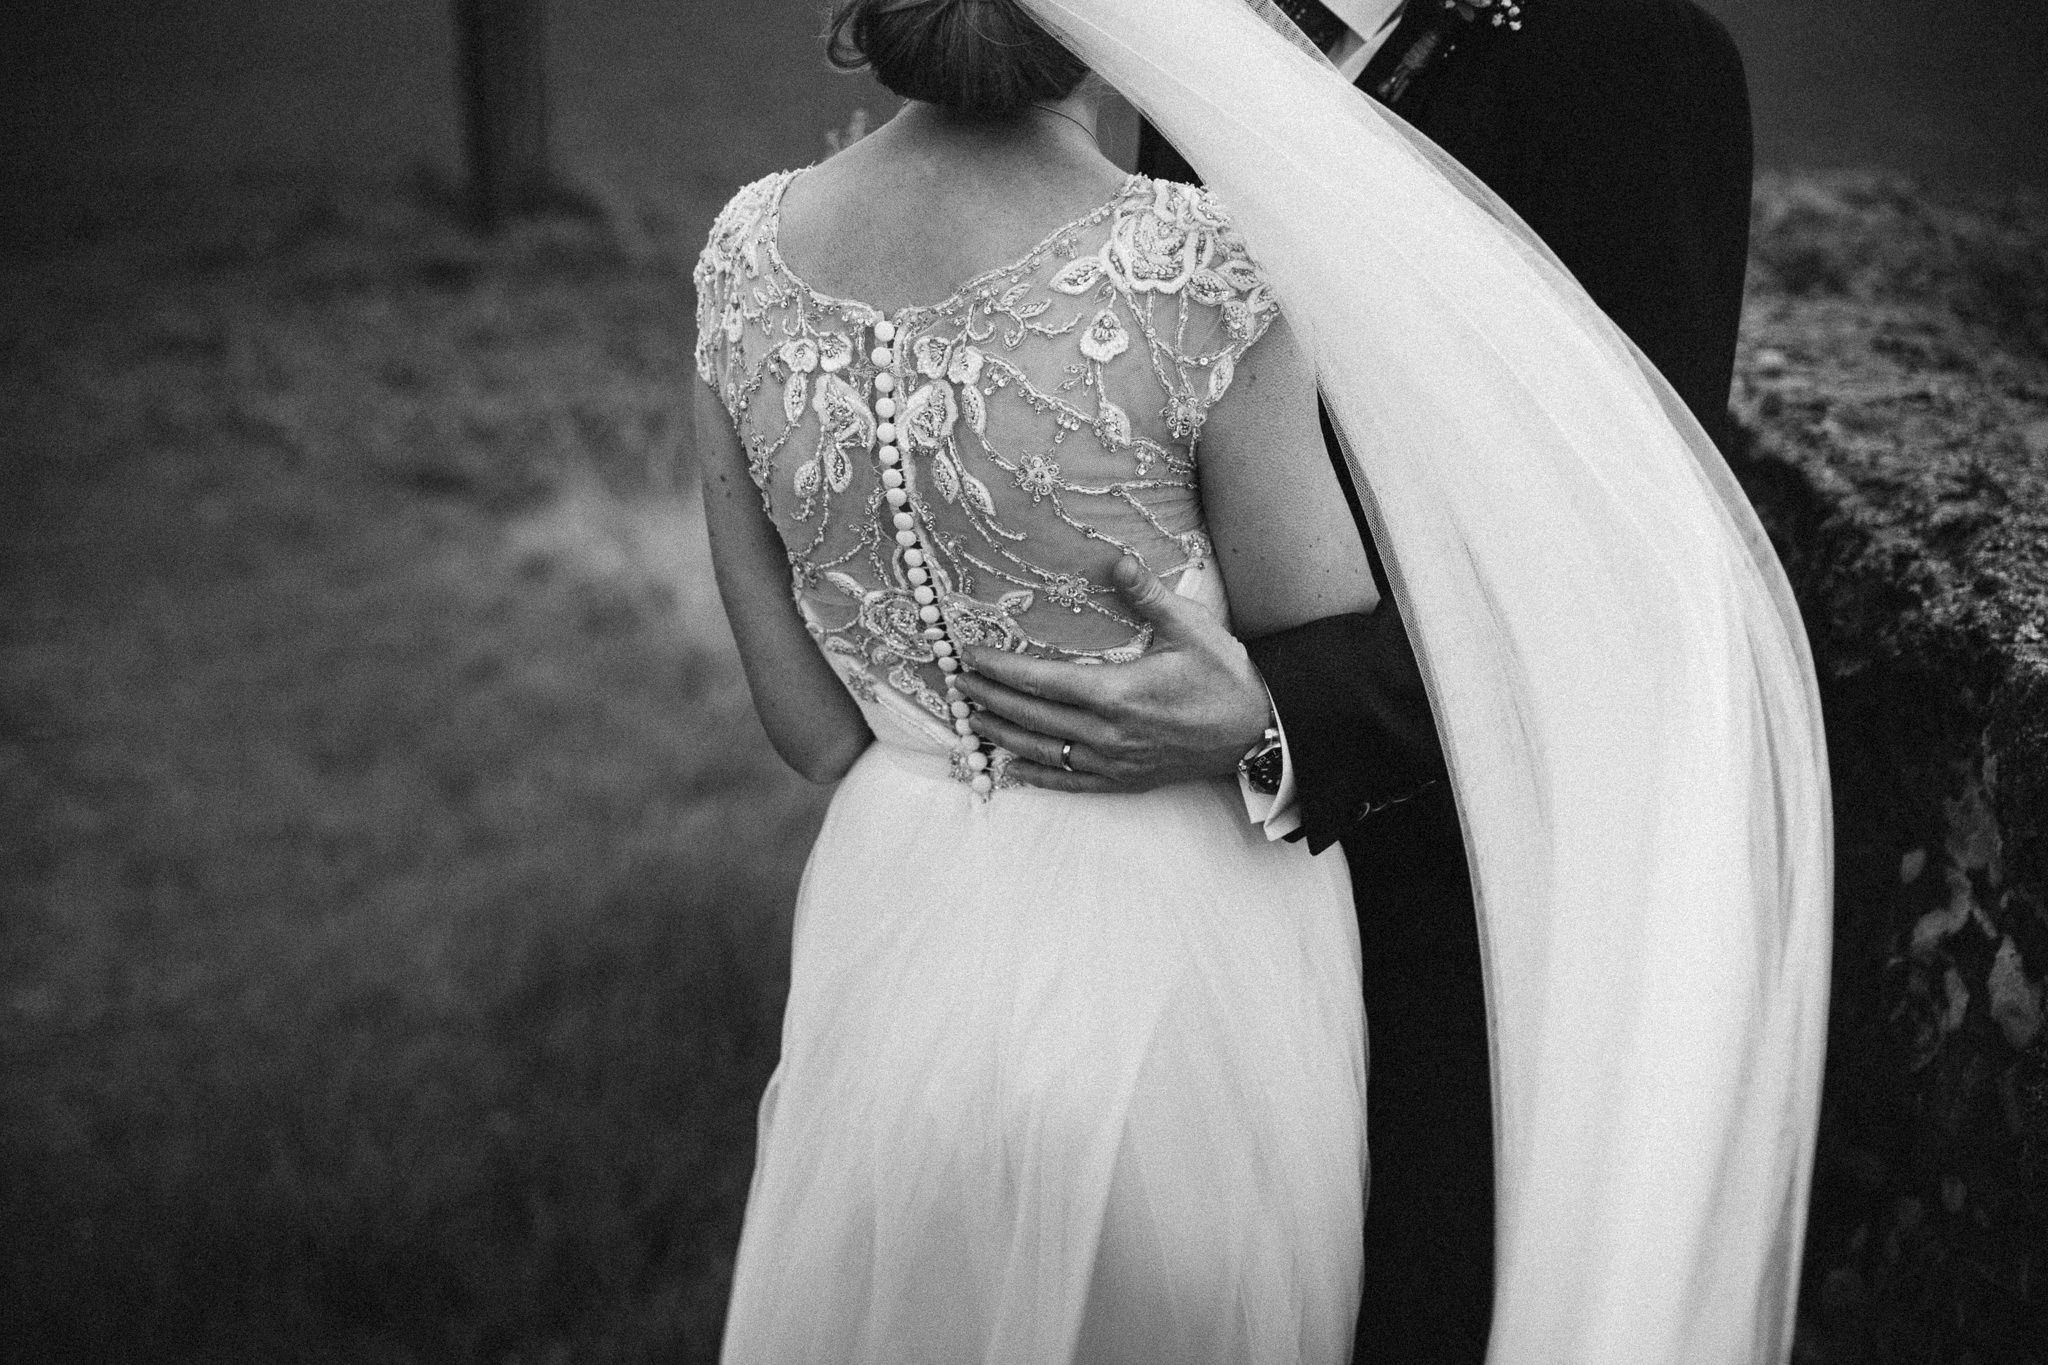 northside-farm-wedding-northumberland-margarita-hope (73).jpg